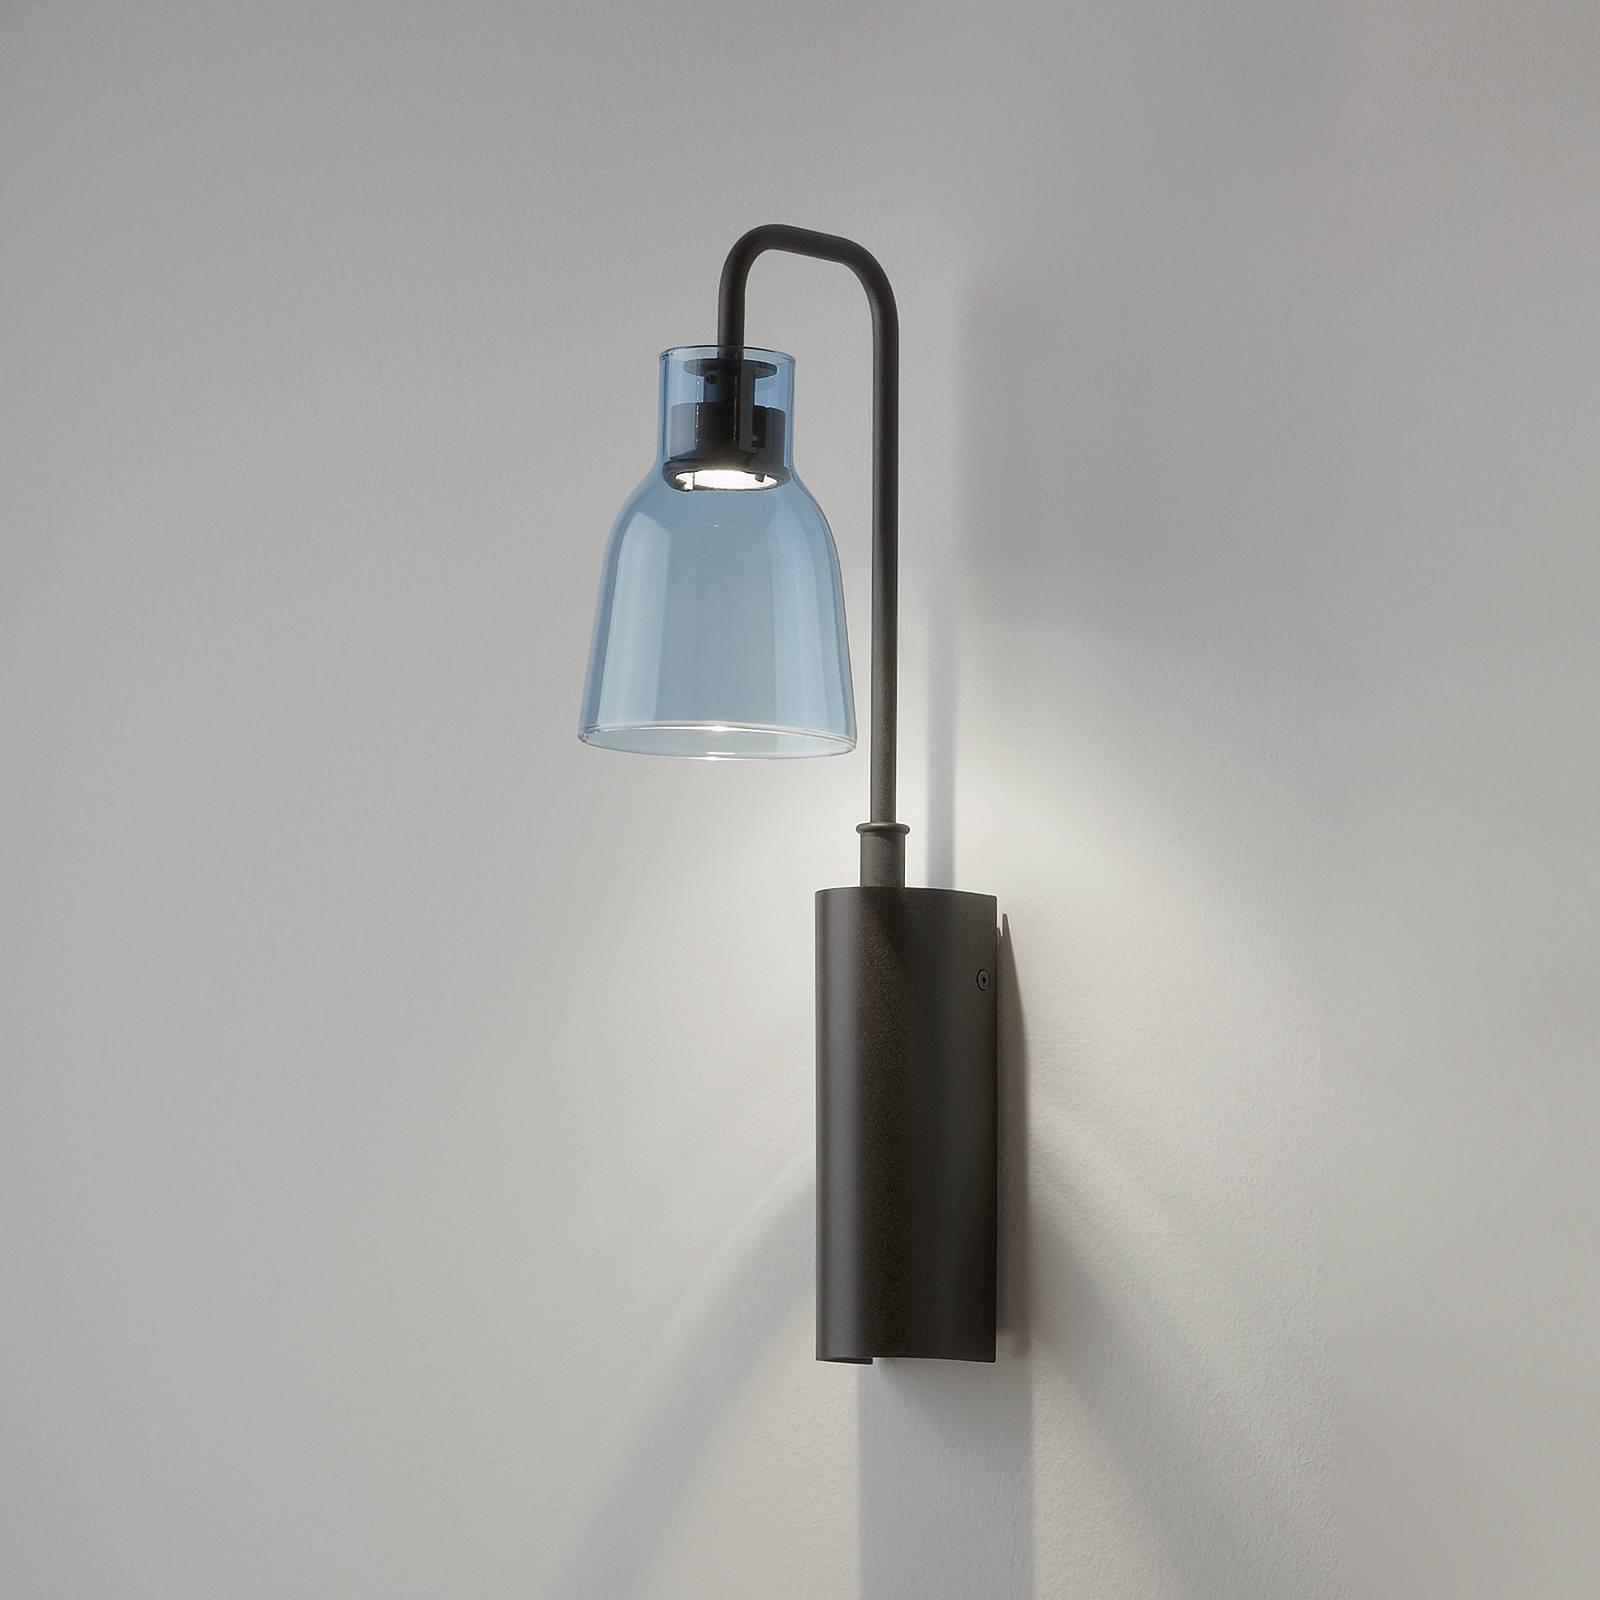 Bover Drip A/02 LED-seinävalaisin, sininen